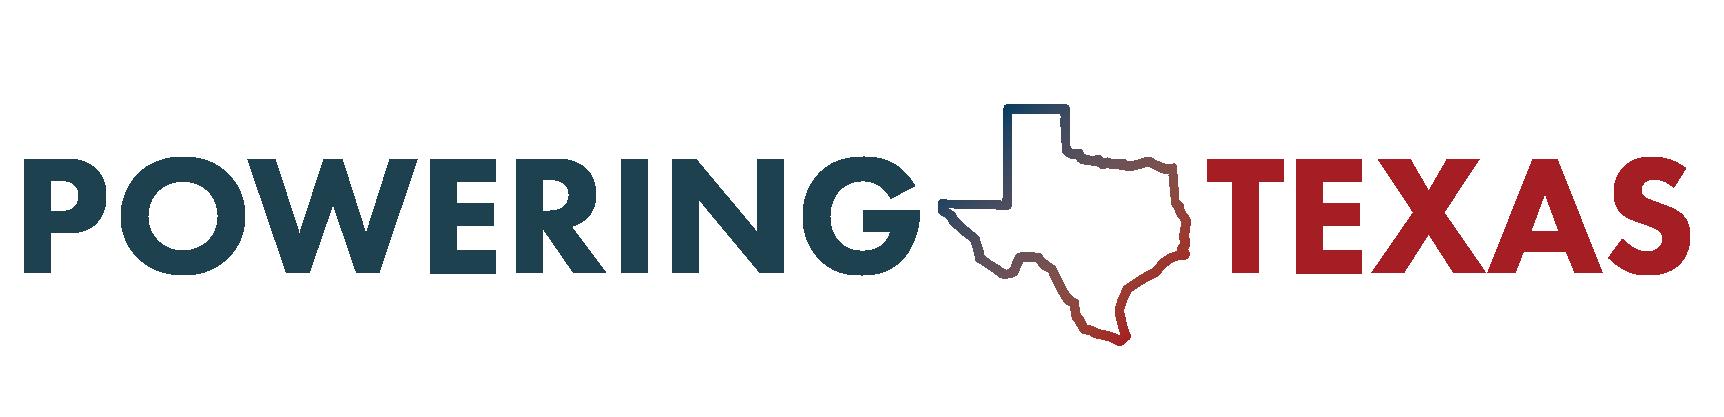 Powering Texas Logo